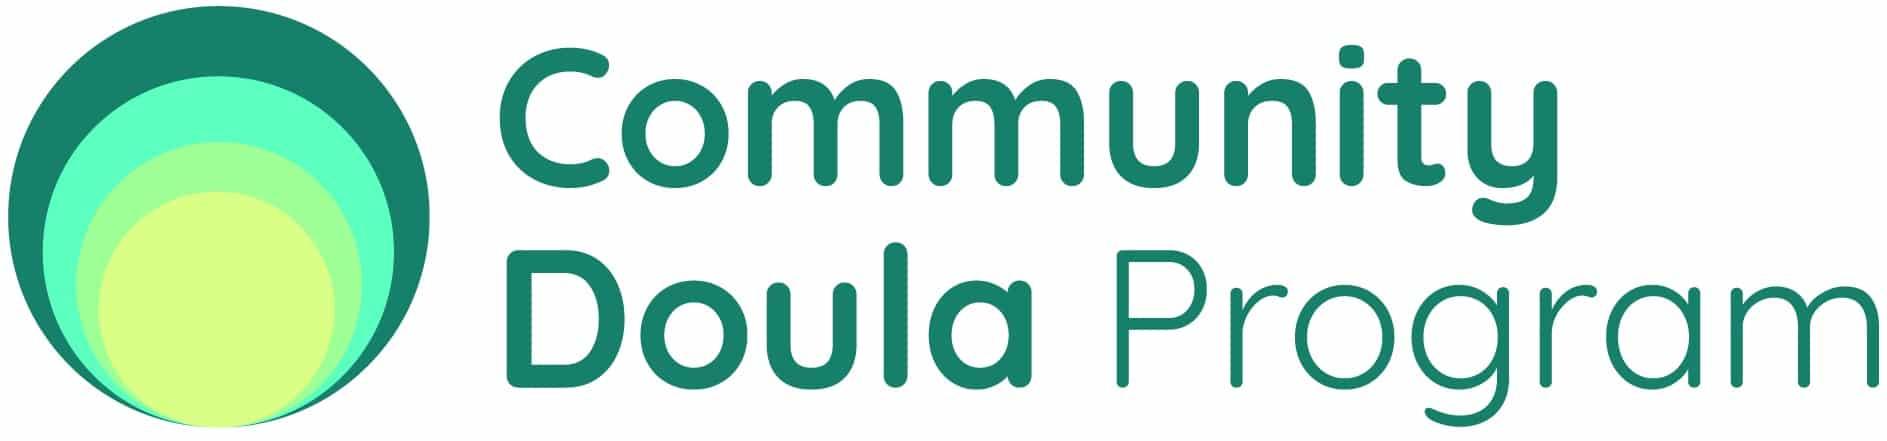 Community Doula Program